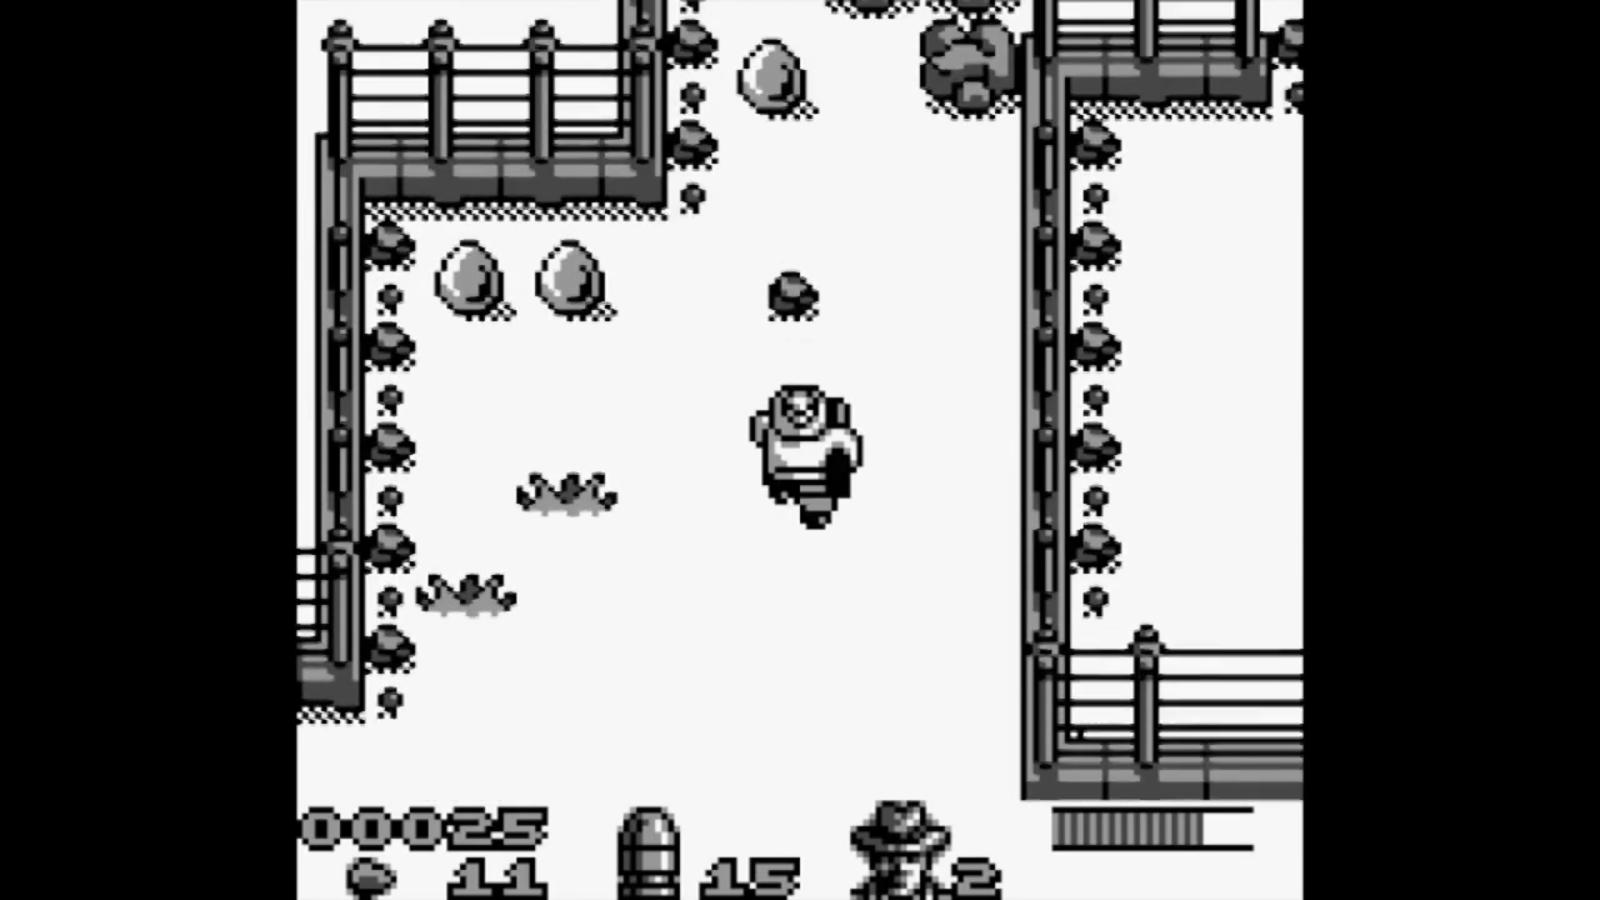 Nintendo Game Boy - Jurassic Park